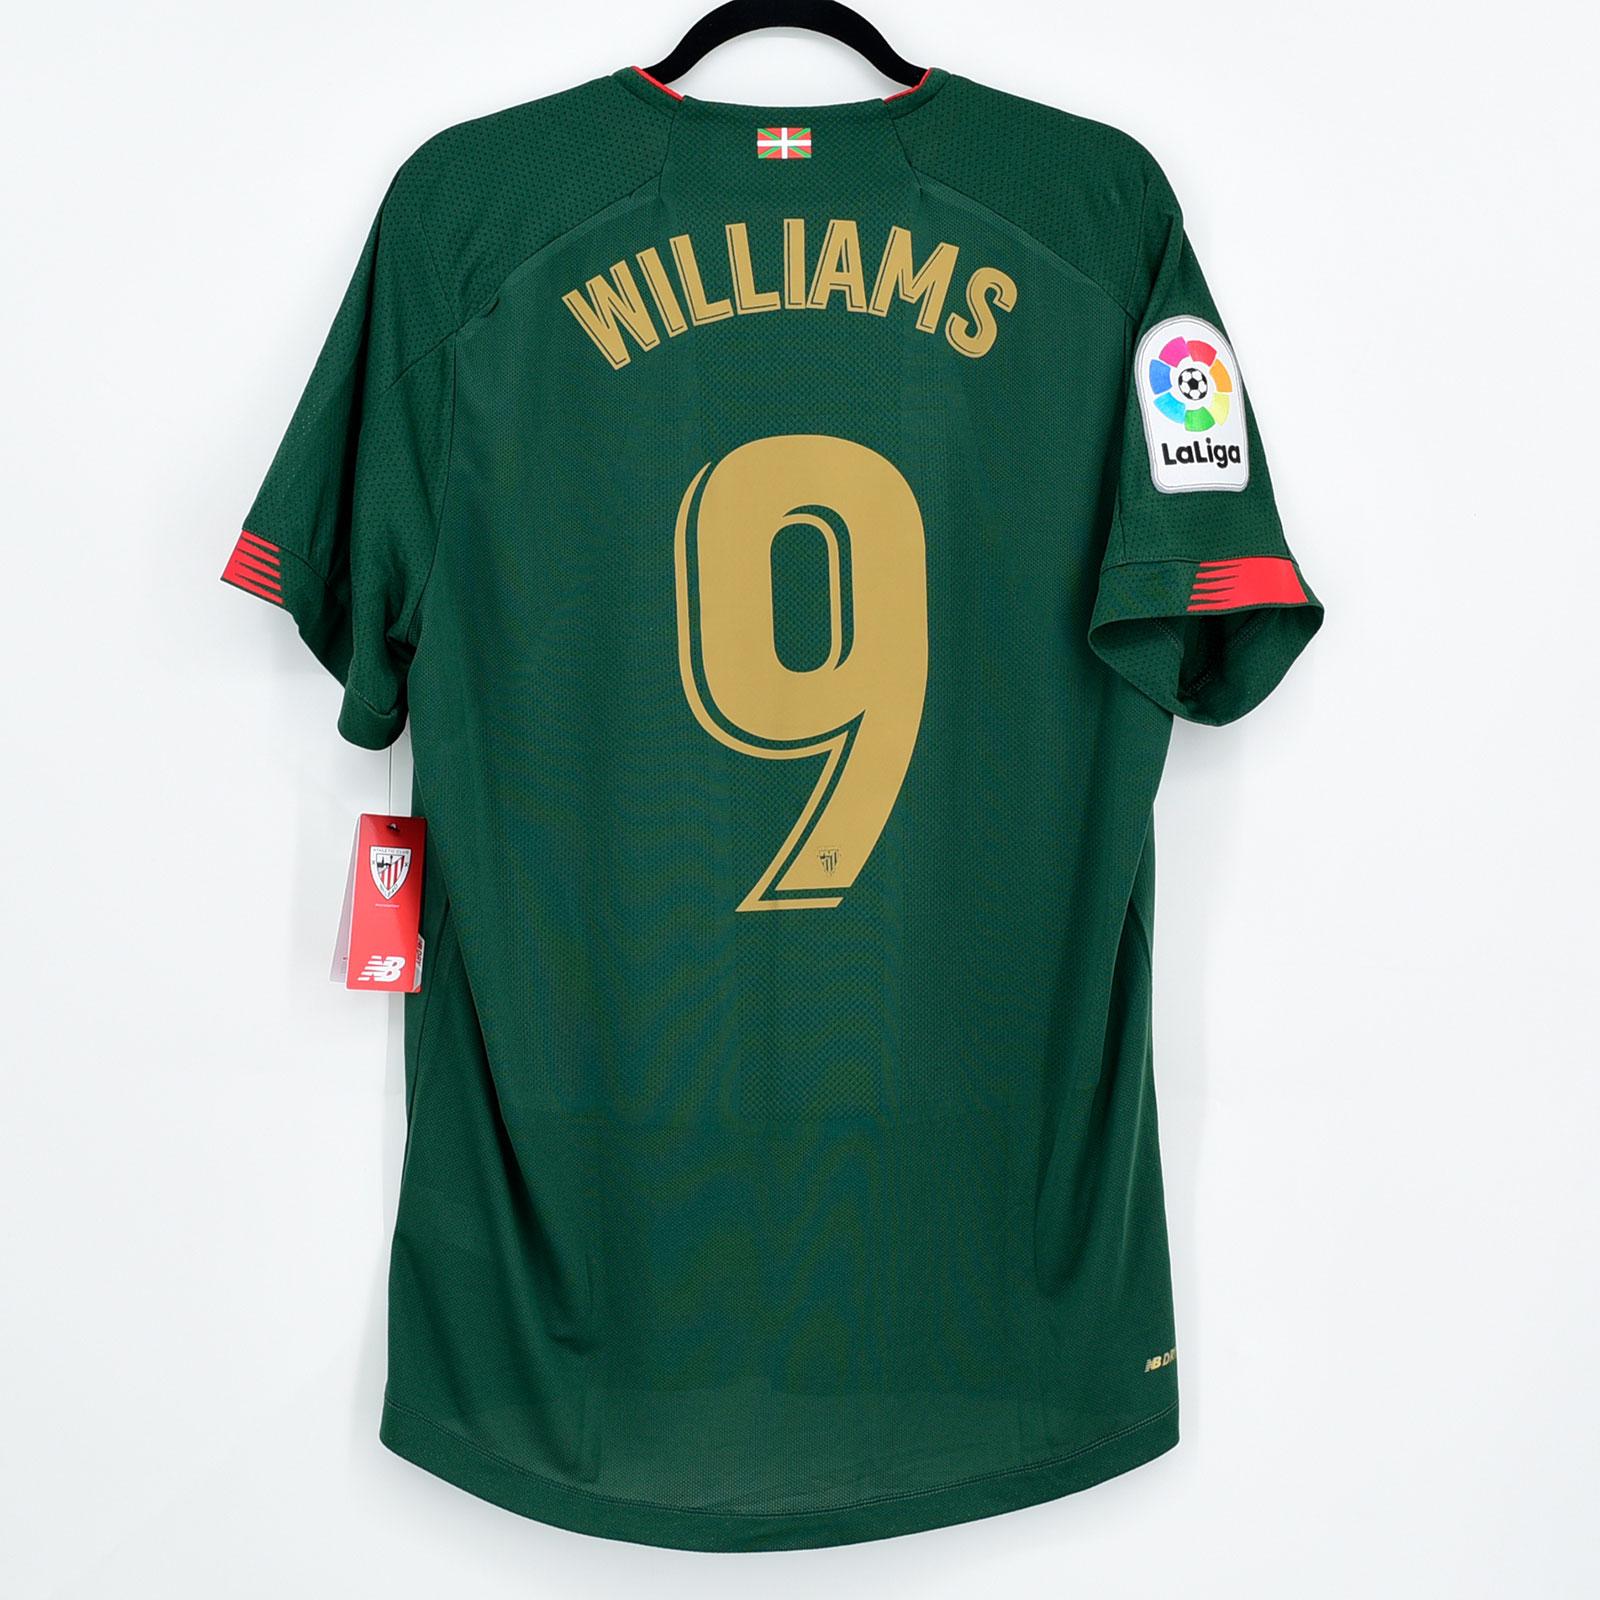 2019-20 Athletic club bilbao away shirt #9 williams * BNWT ...